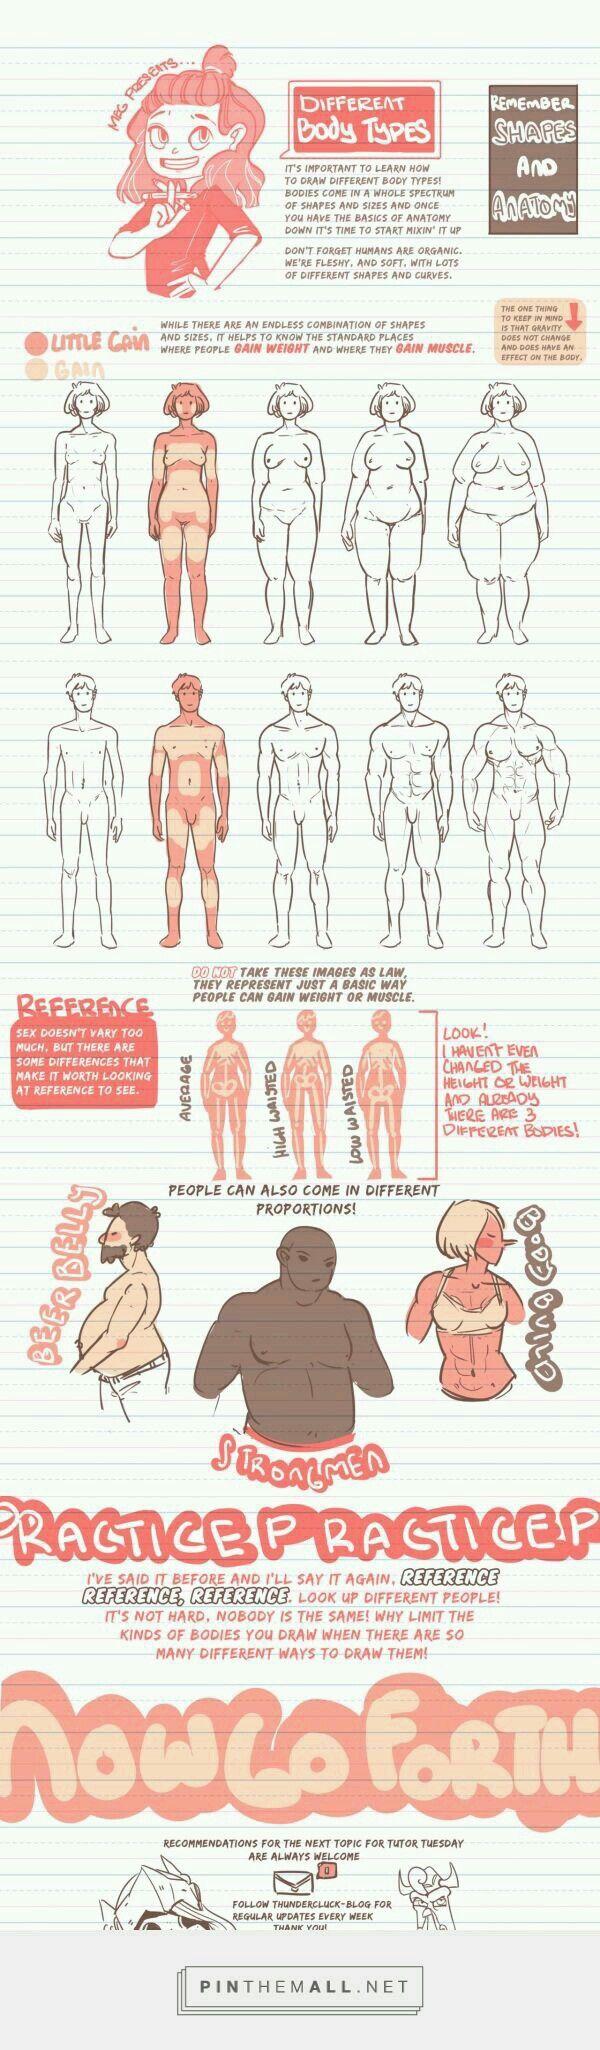 Pin de Paloma Aguirre Pratt en Anatomy references   Pinterest ...